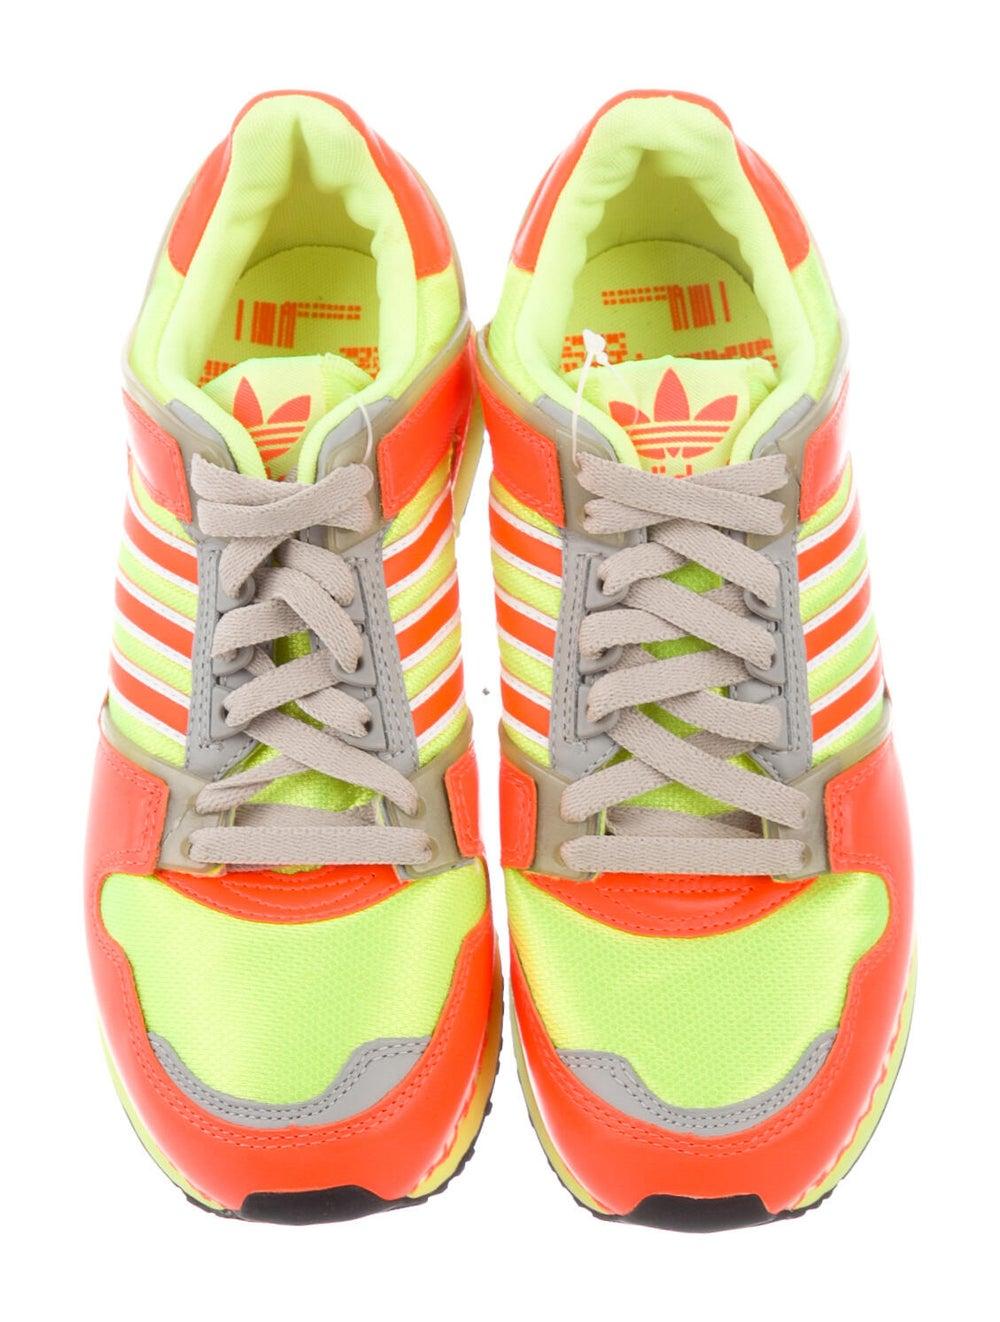 Adidas Leather Printed Athletic Sneakers Orange - image 3